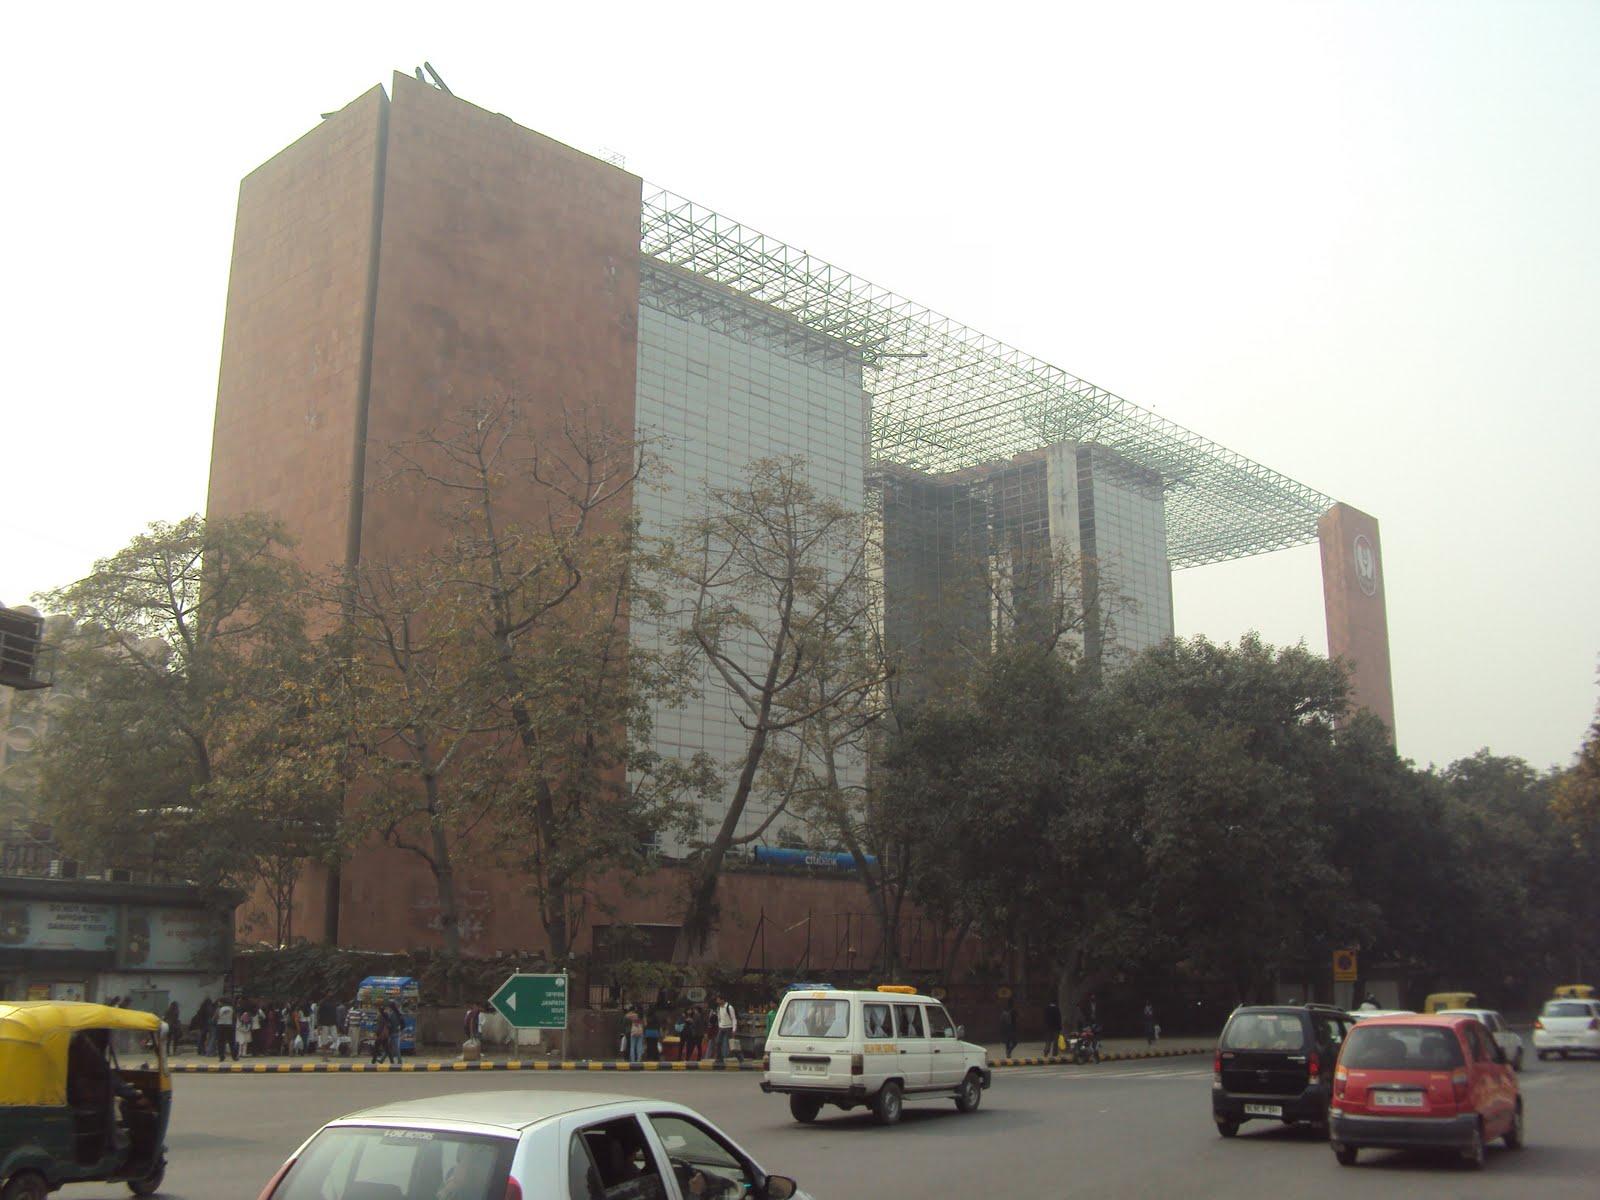 Architecture student 39 s corner lutyen 39 s delhi part 2 for Space arch delhi